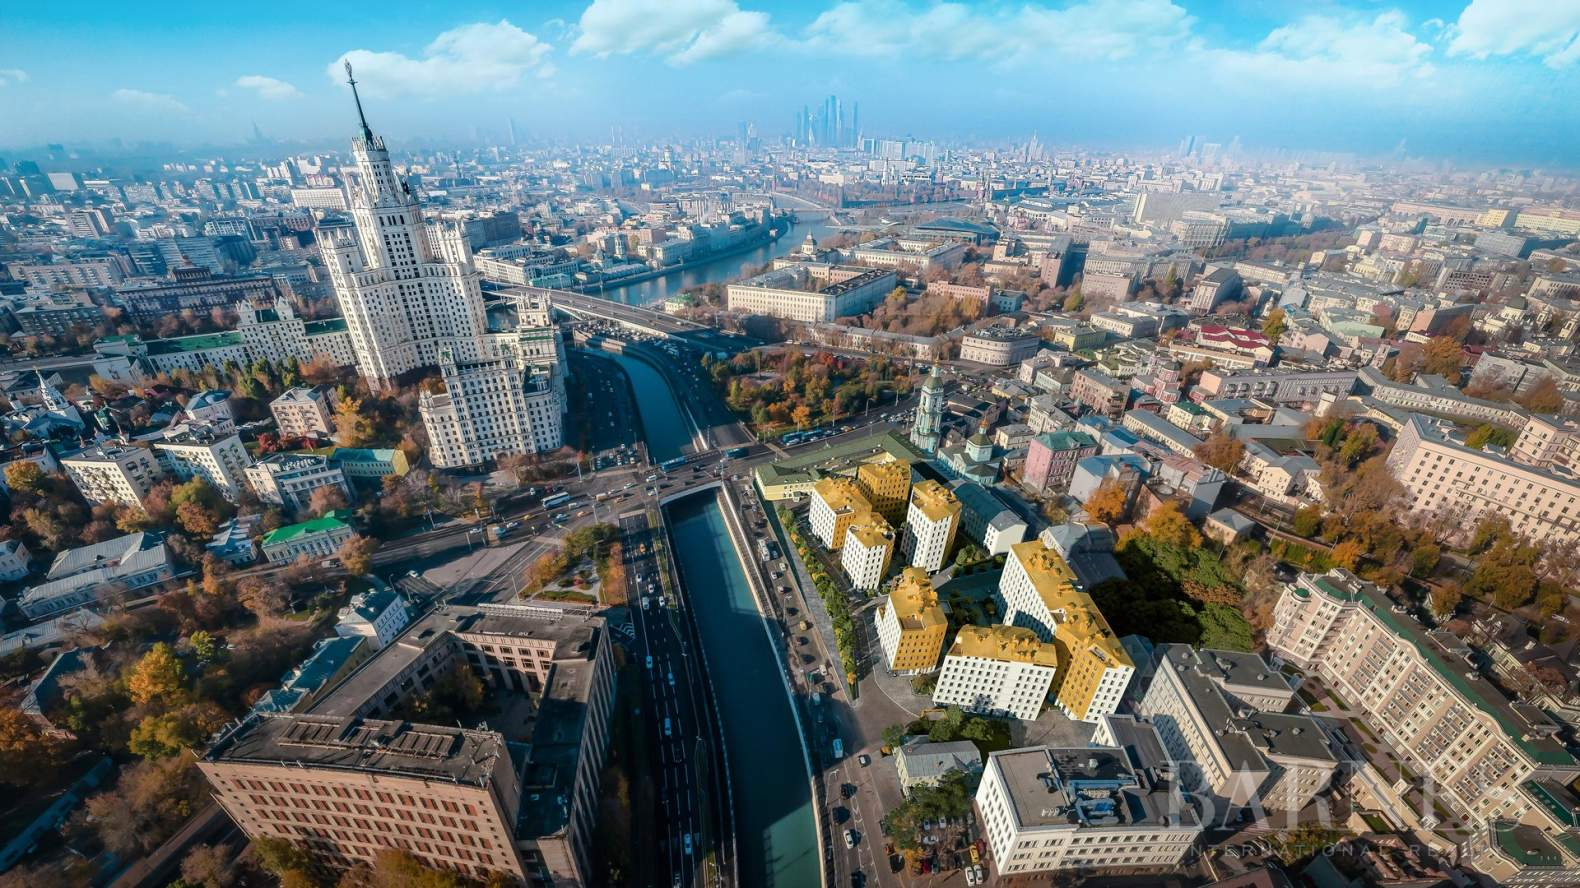 Moscow  - Hовостройки Москвы  - picture 5